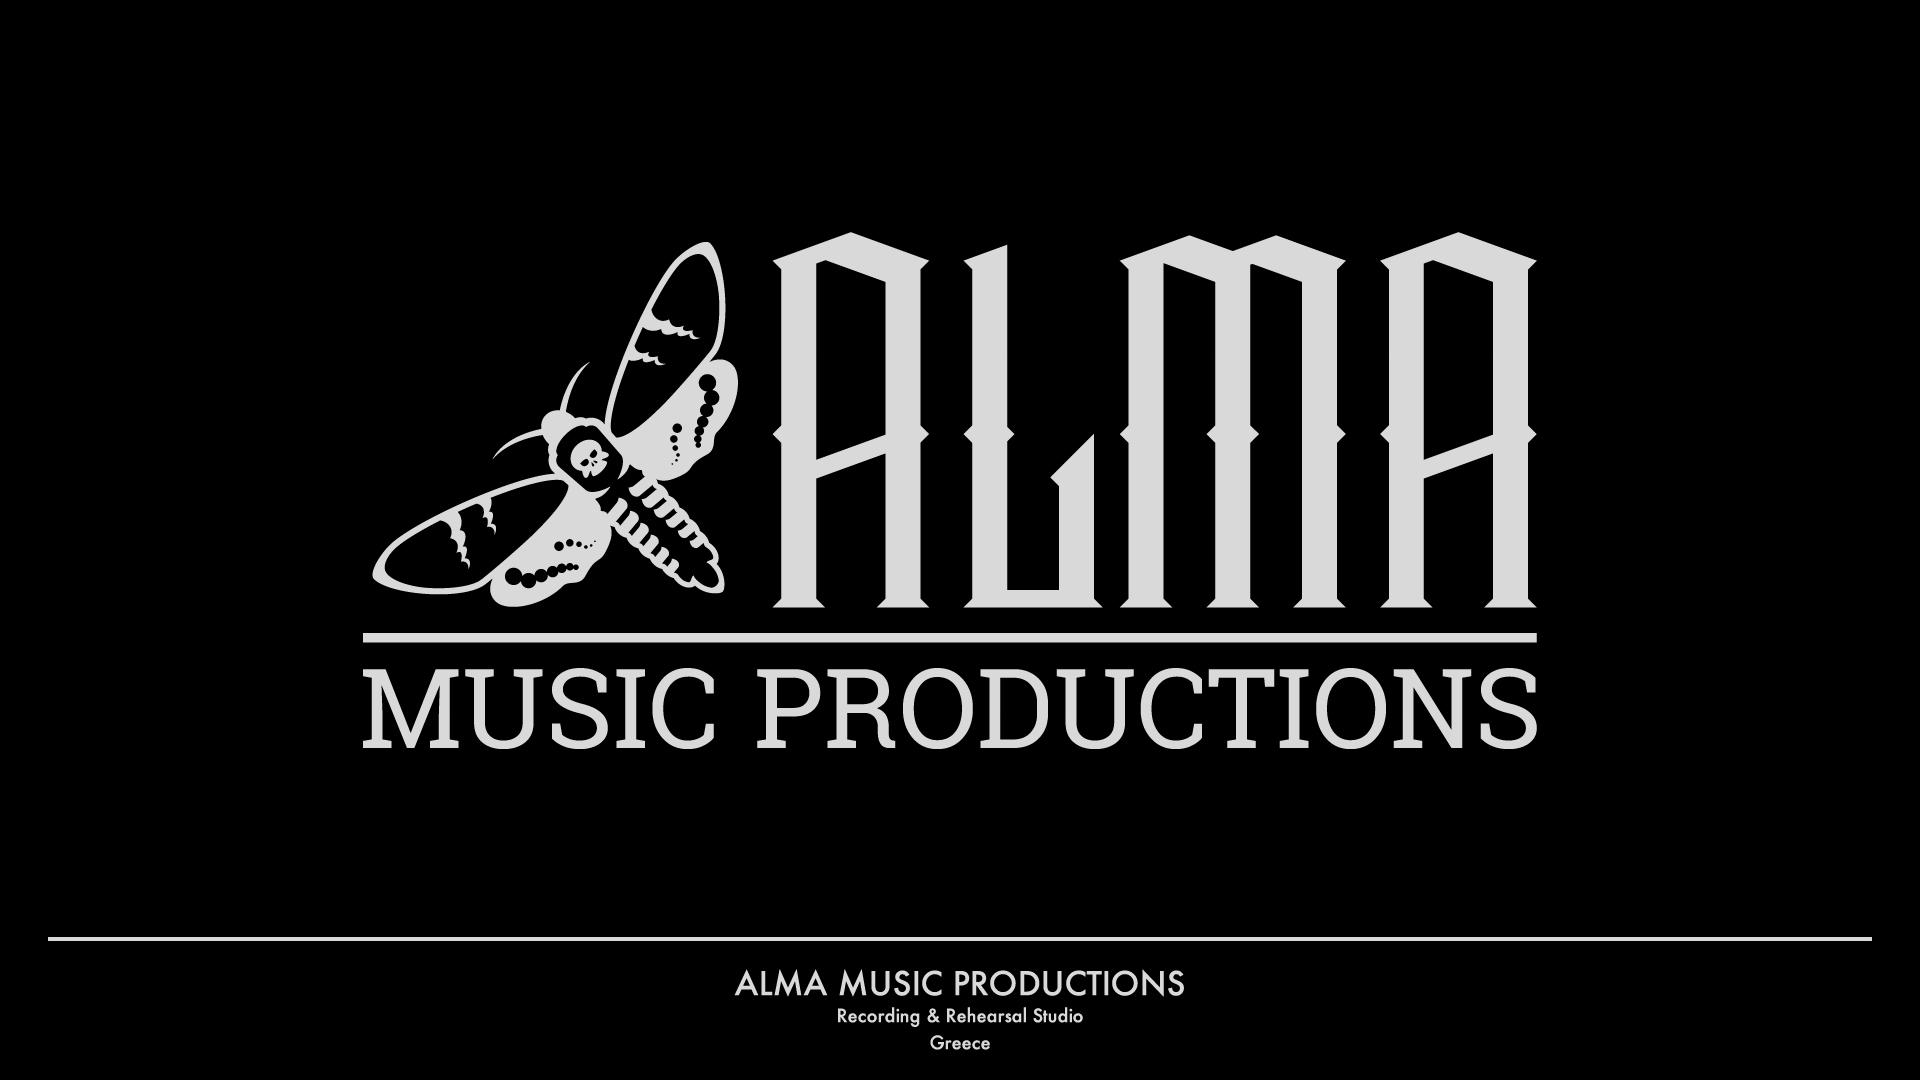 Alma_Music_Productions.jpg